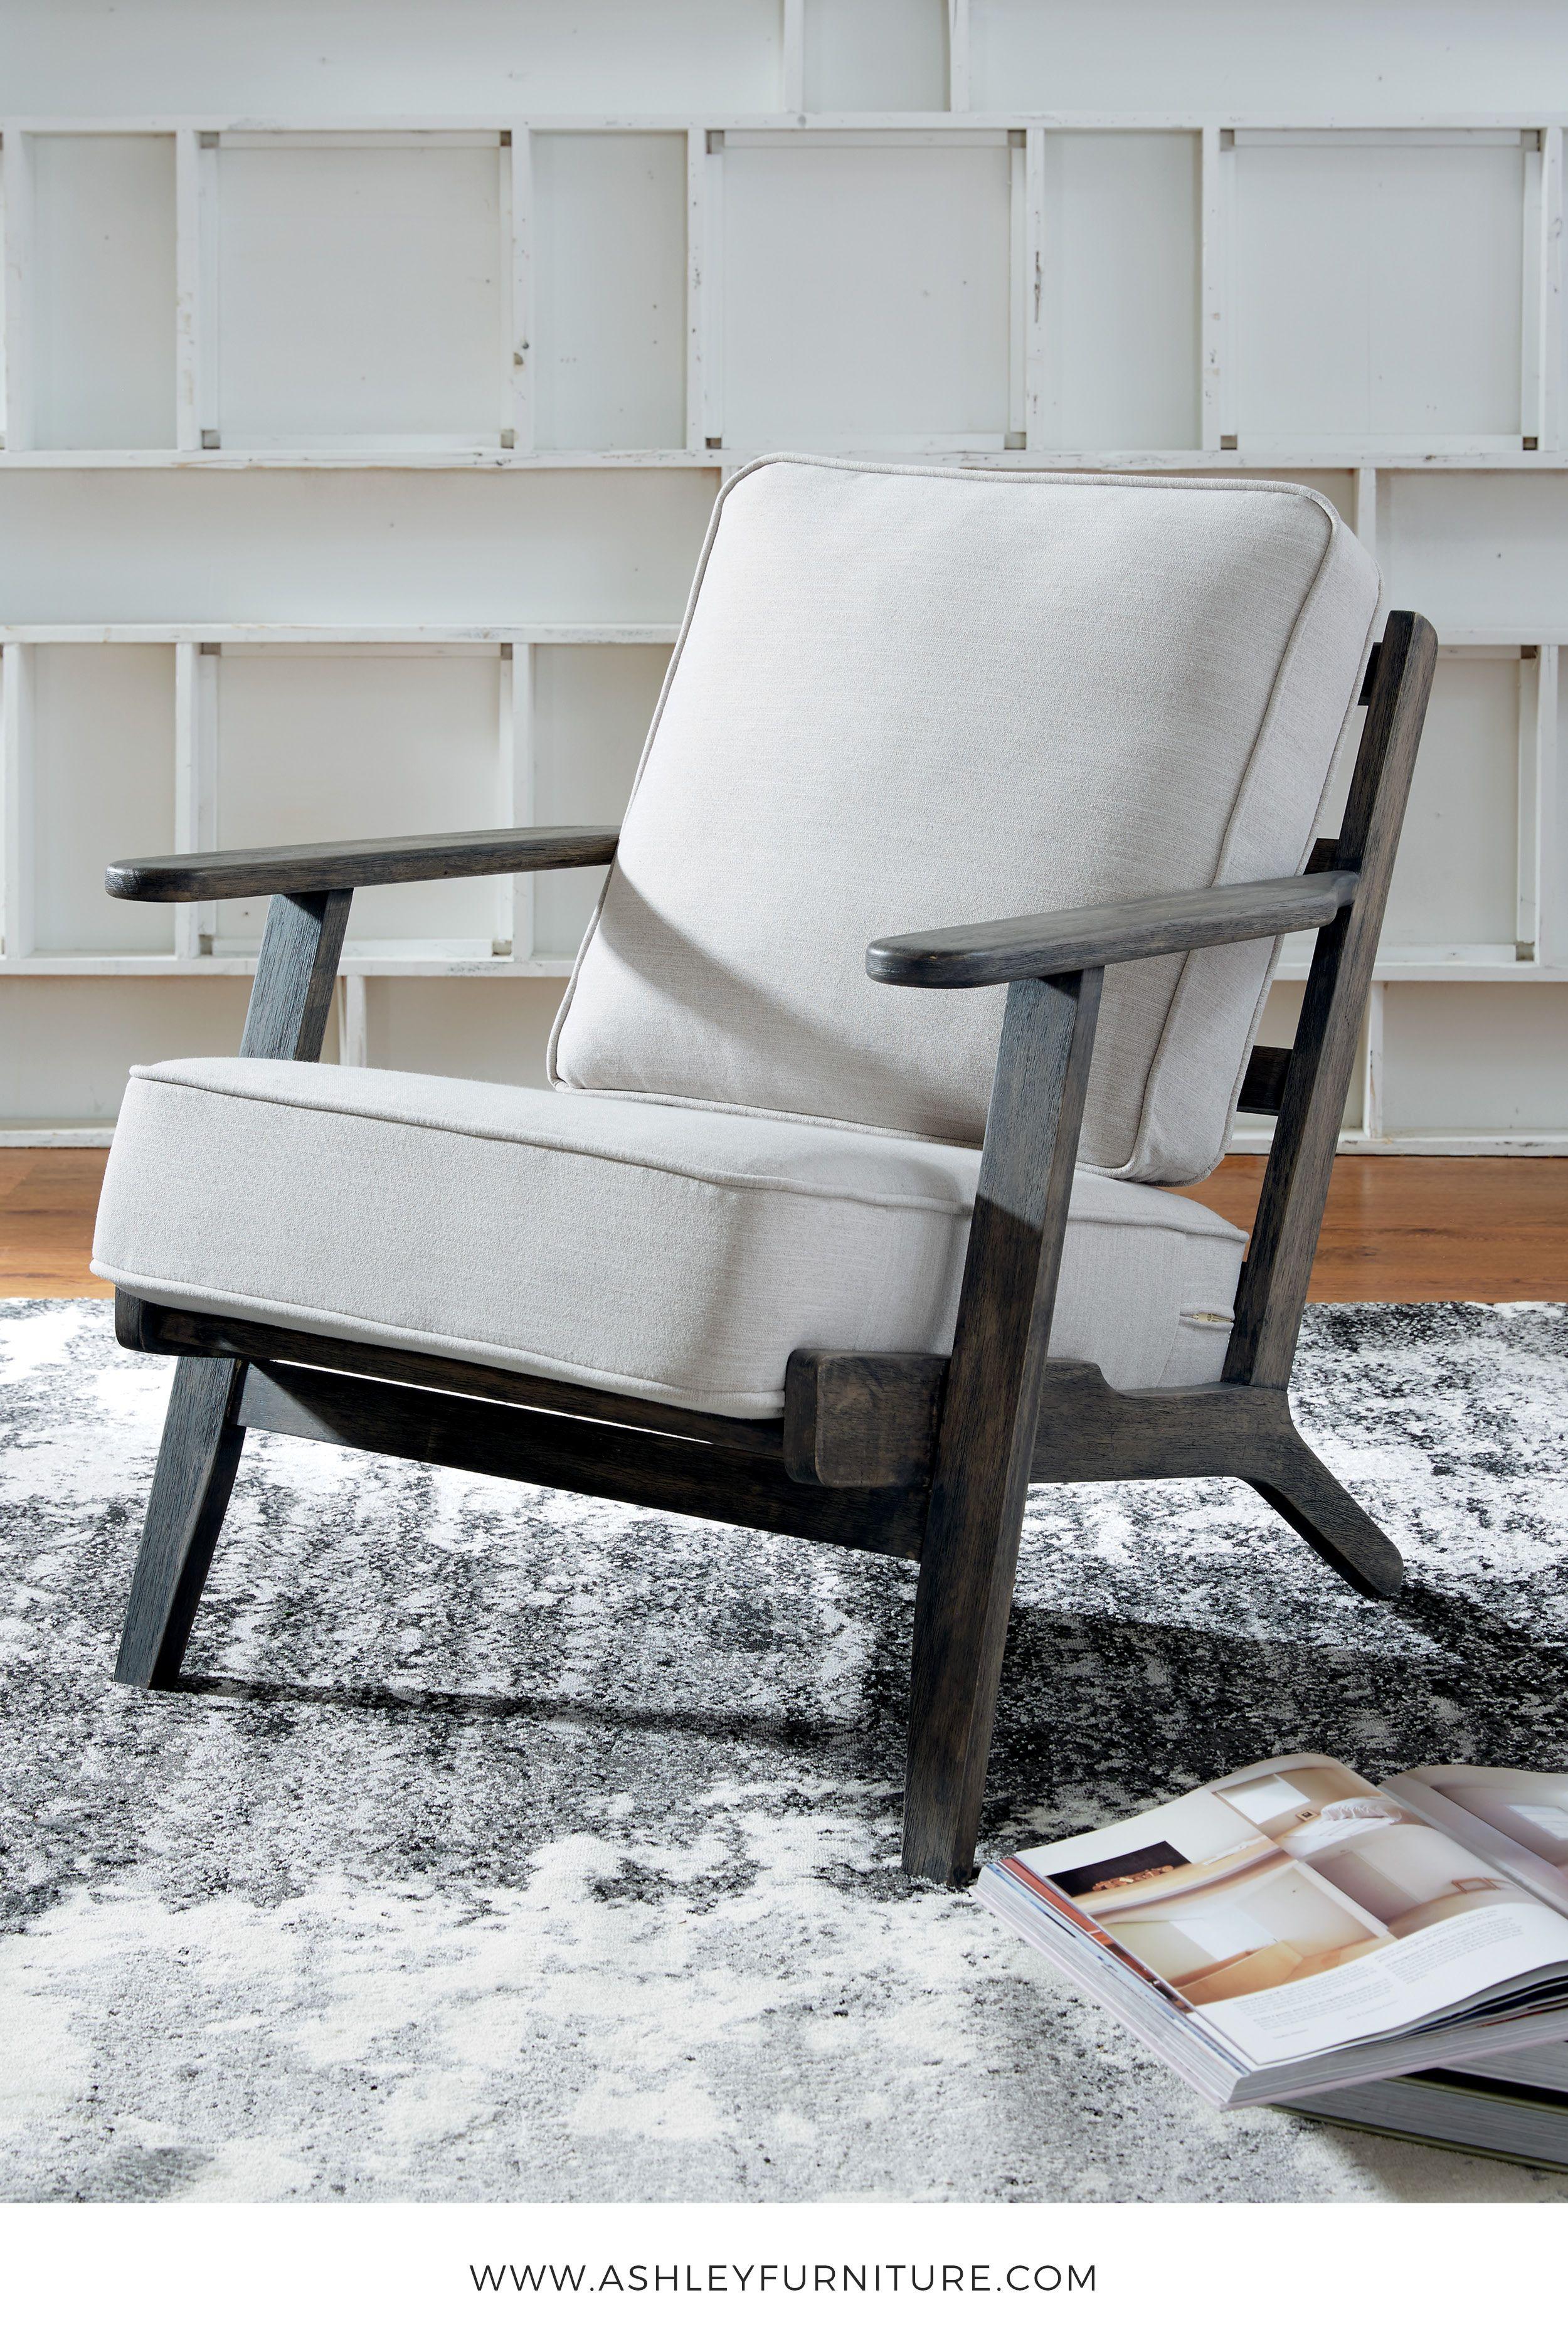 Trebbin Cream Casual Accent Chair By Ashley Furniture